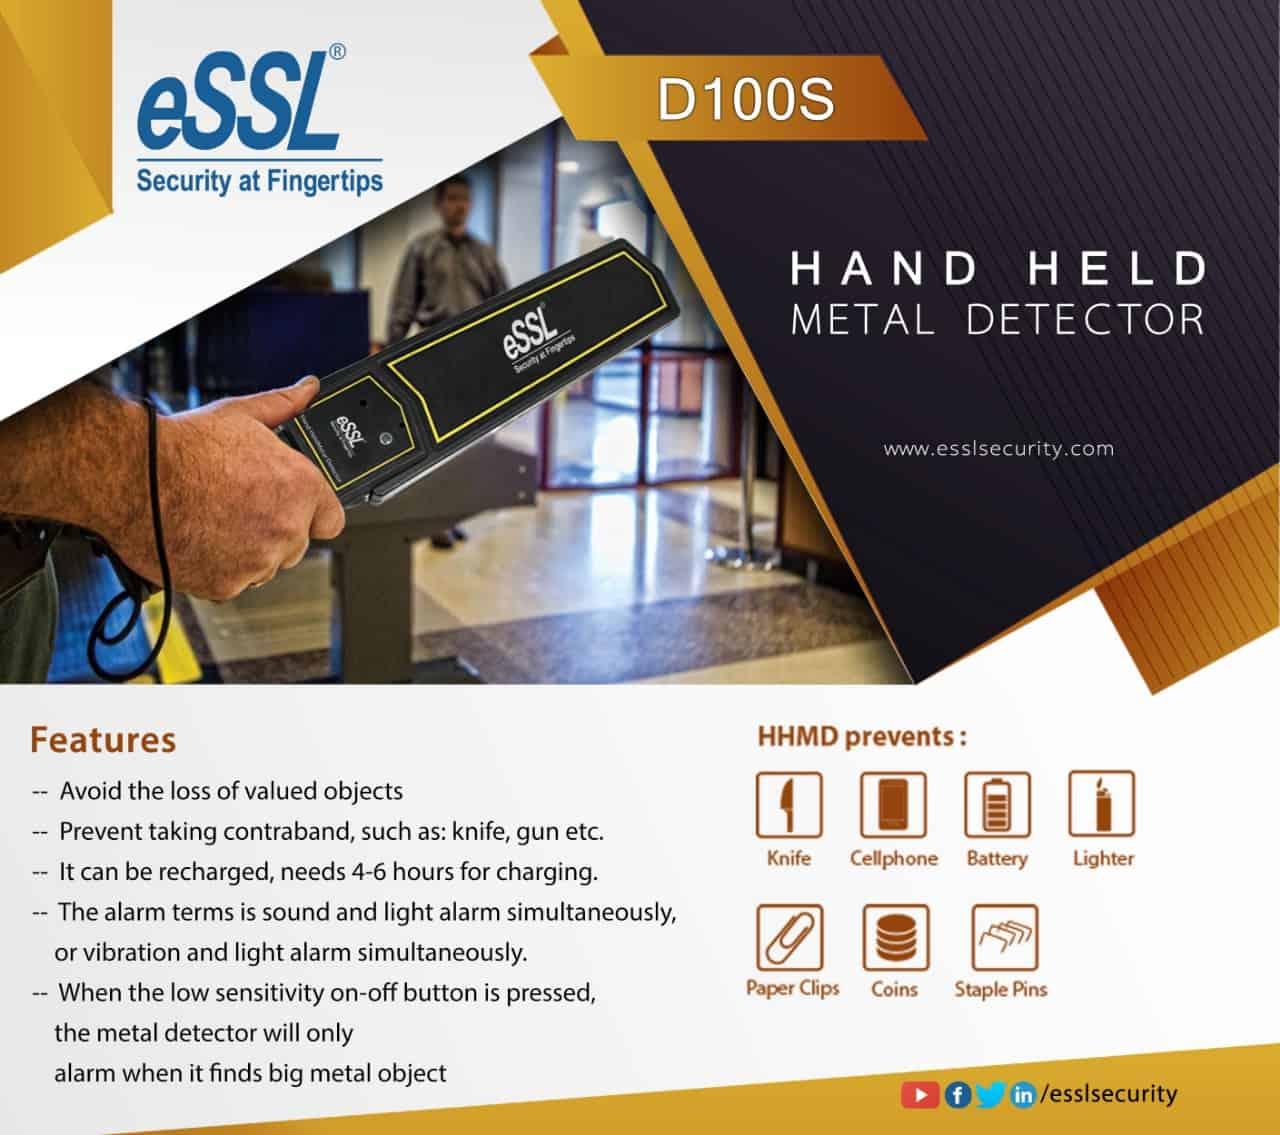 Handheld Metal Detector - HHDM Distributors & Suppliers eSSL ZKTeco